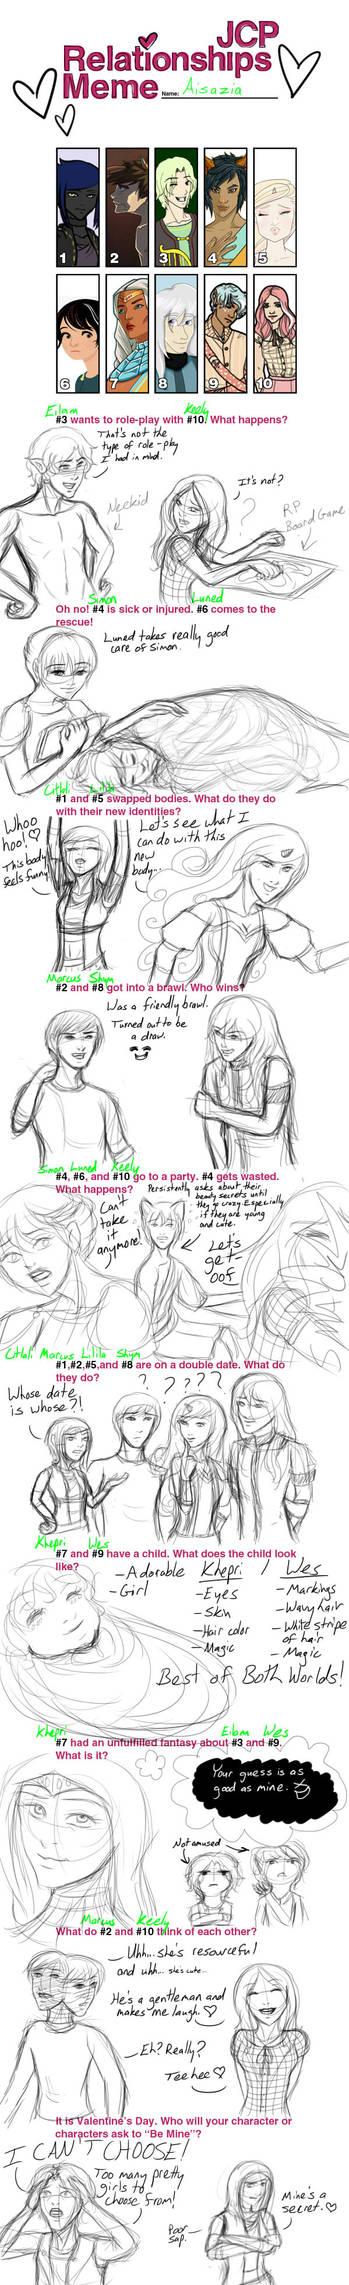 JCP: Valentine's Meme 2012